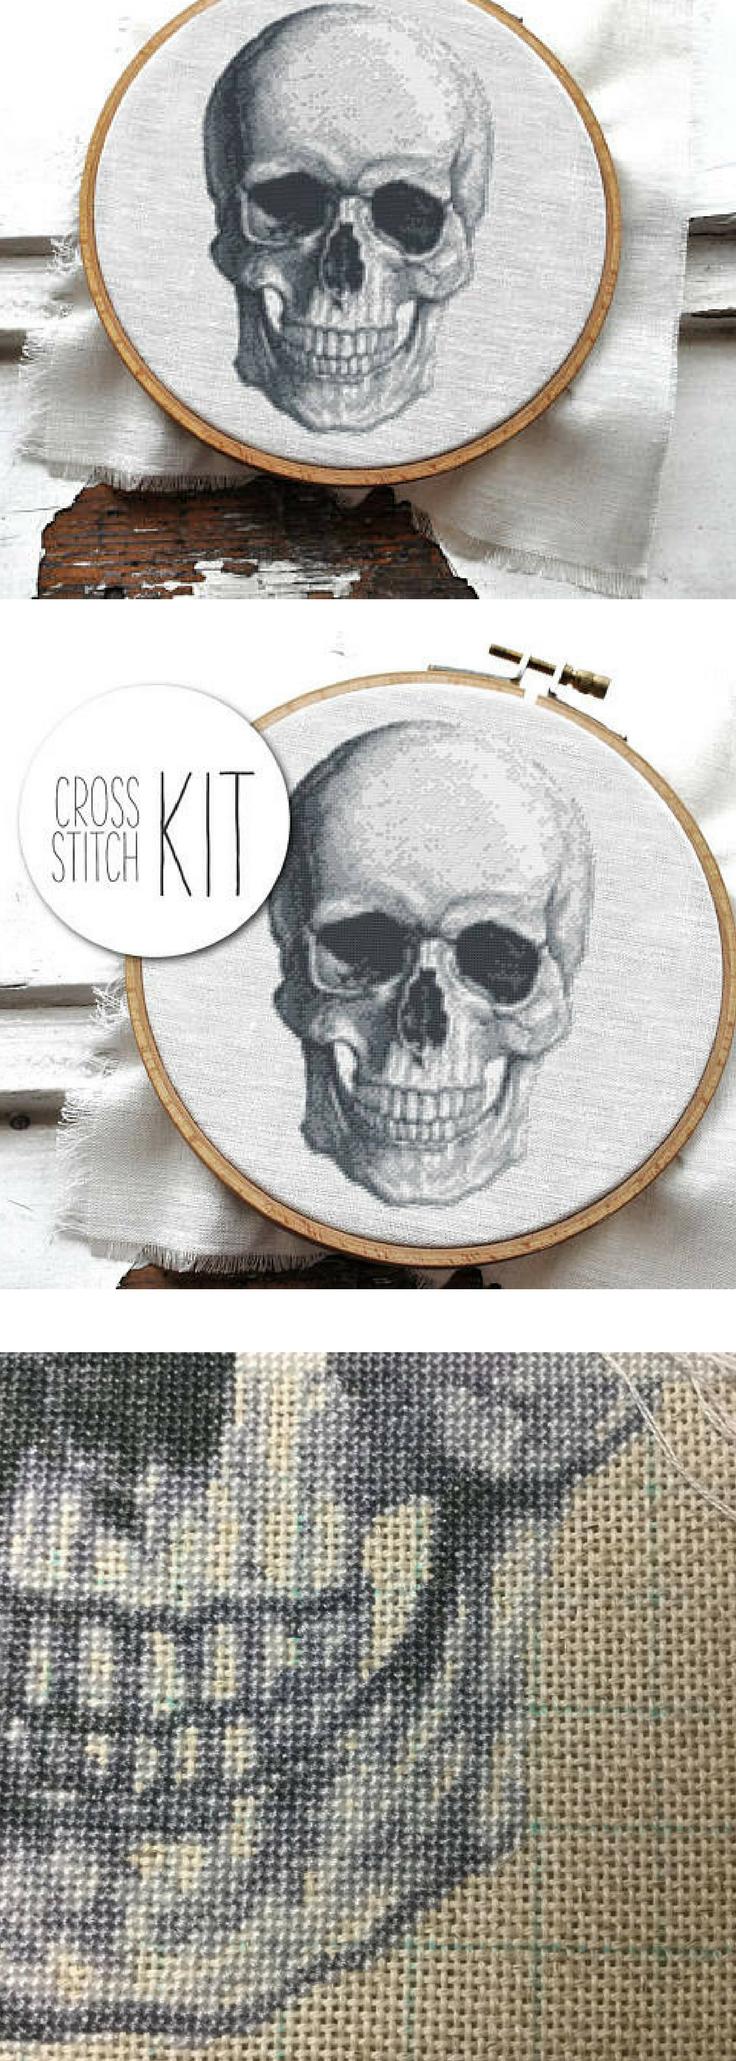 Modern Cross Stitch Kit Anatomical Skull Unique Black And White